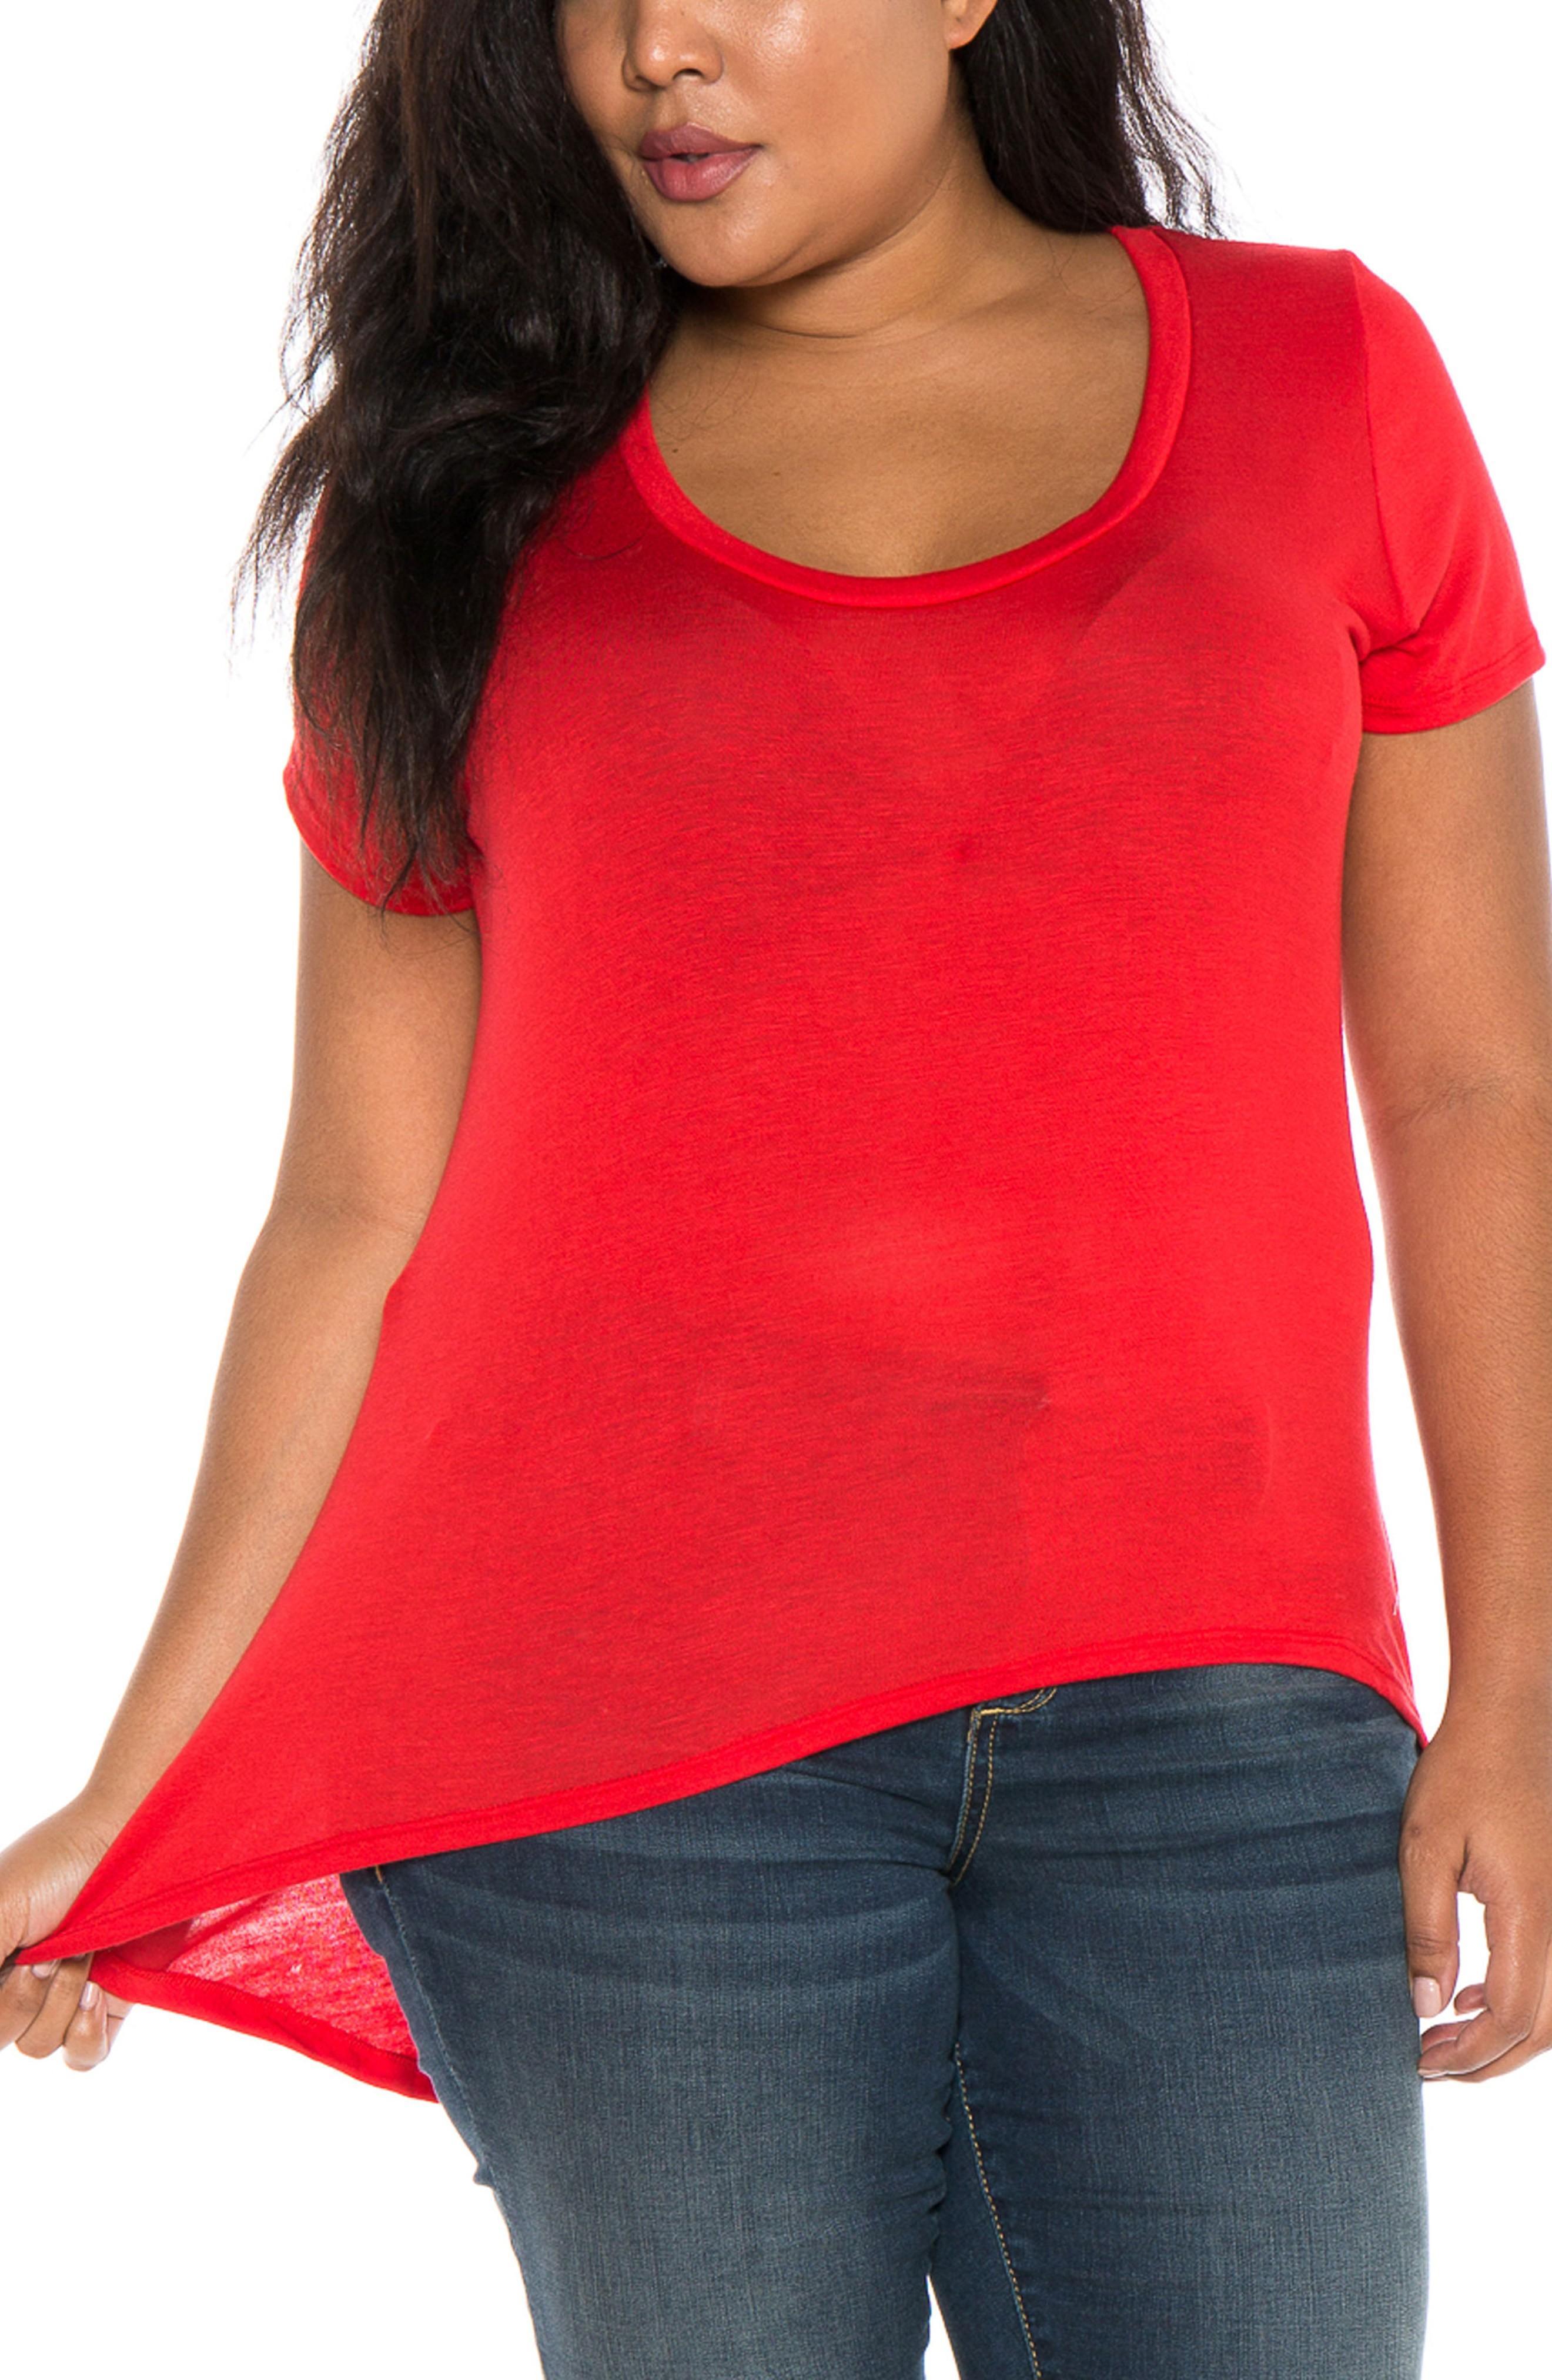 Slink Jeans High/low Scoop Neck Tee In Red